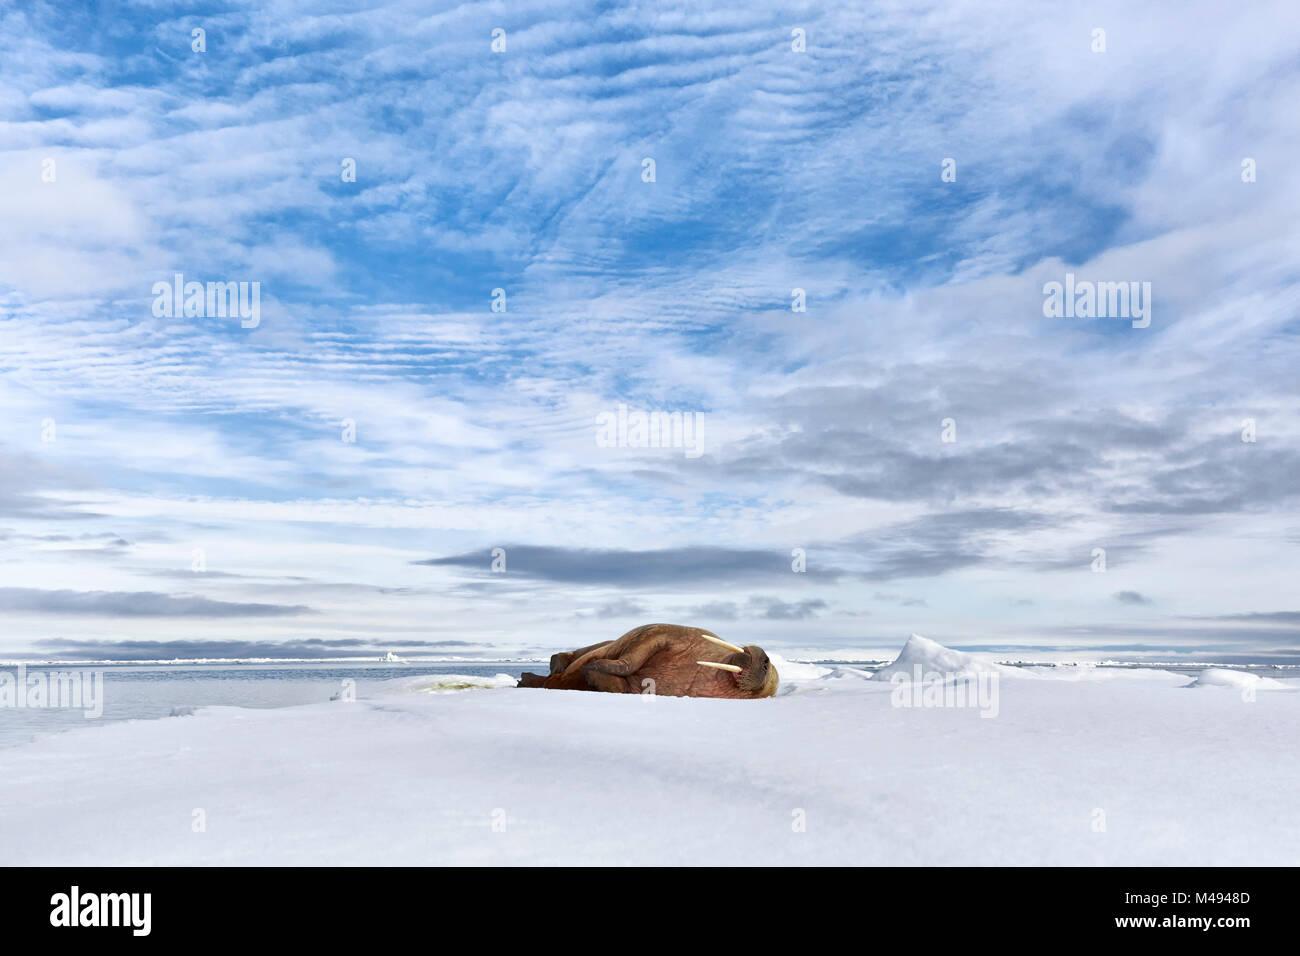 Atlantic walrus (Odobenus rosmarus rosmarus) sleeping on ice during a sunny summer evening in Svalbard, Norway, - Stock Image